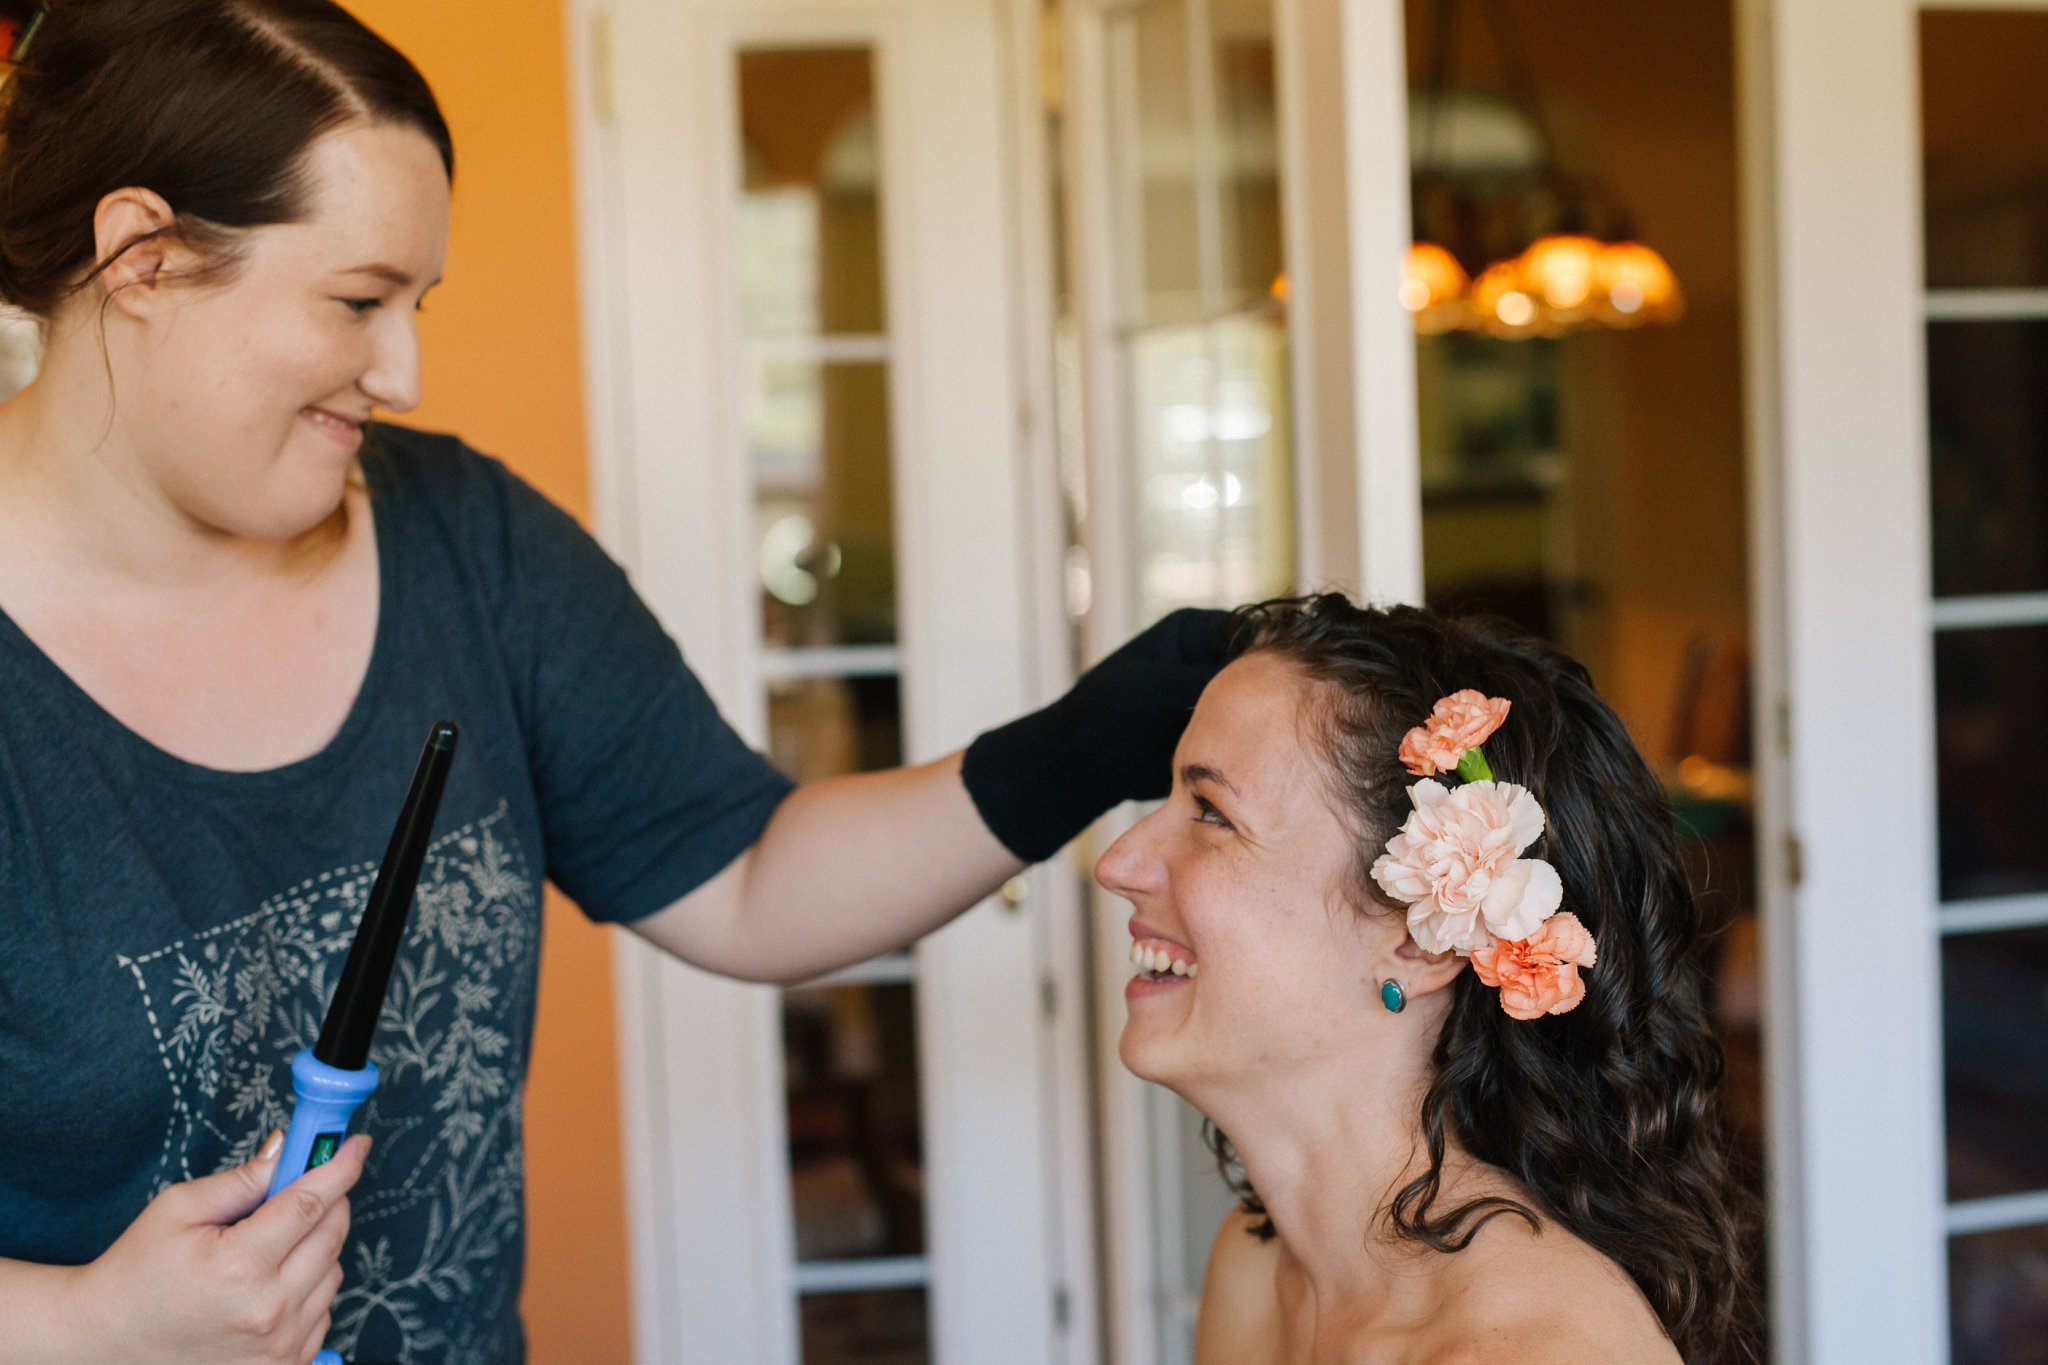 Phoenix documentary candid wedding photographer